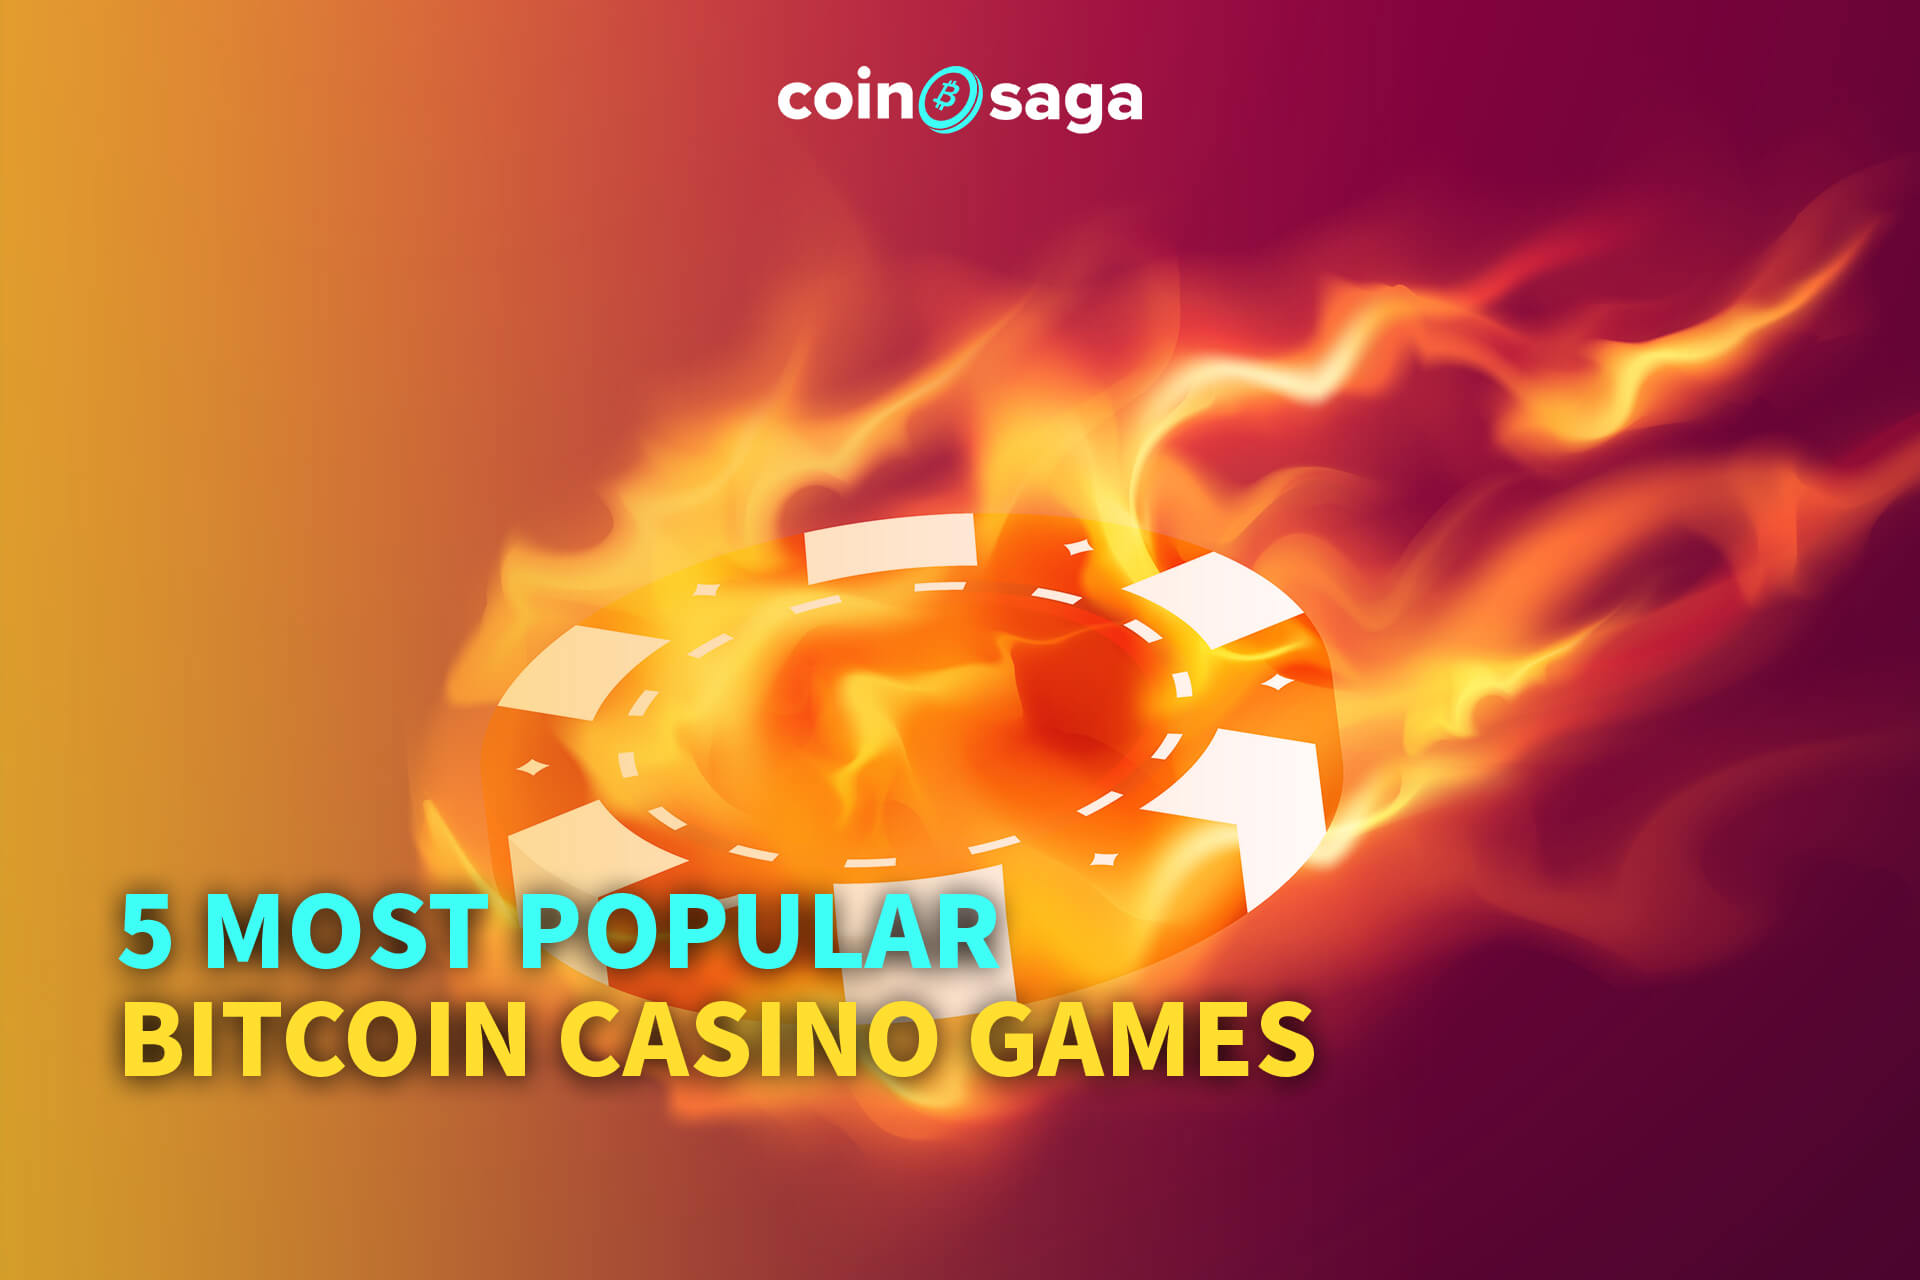 The 5 Most Popular Bitcoin Casino Games